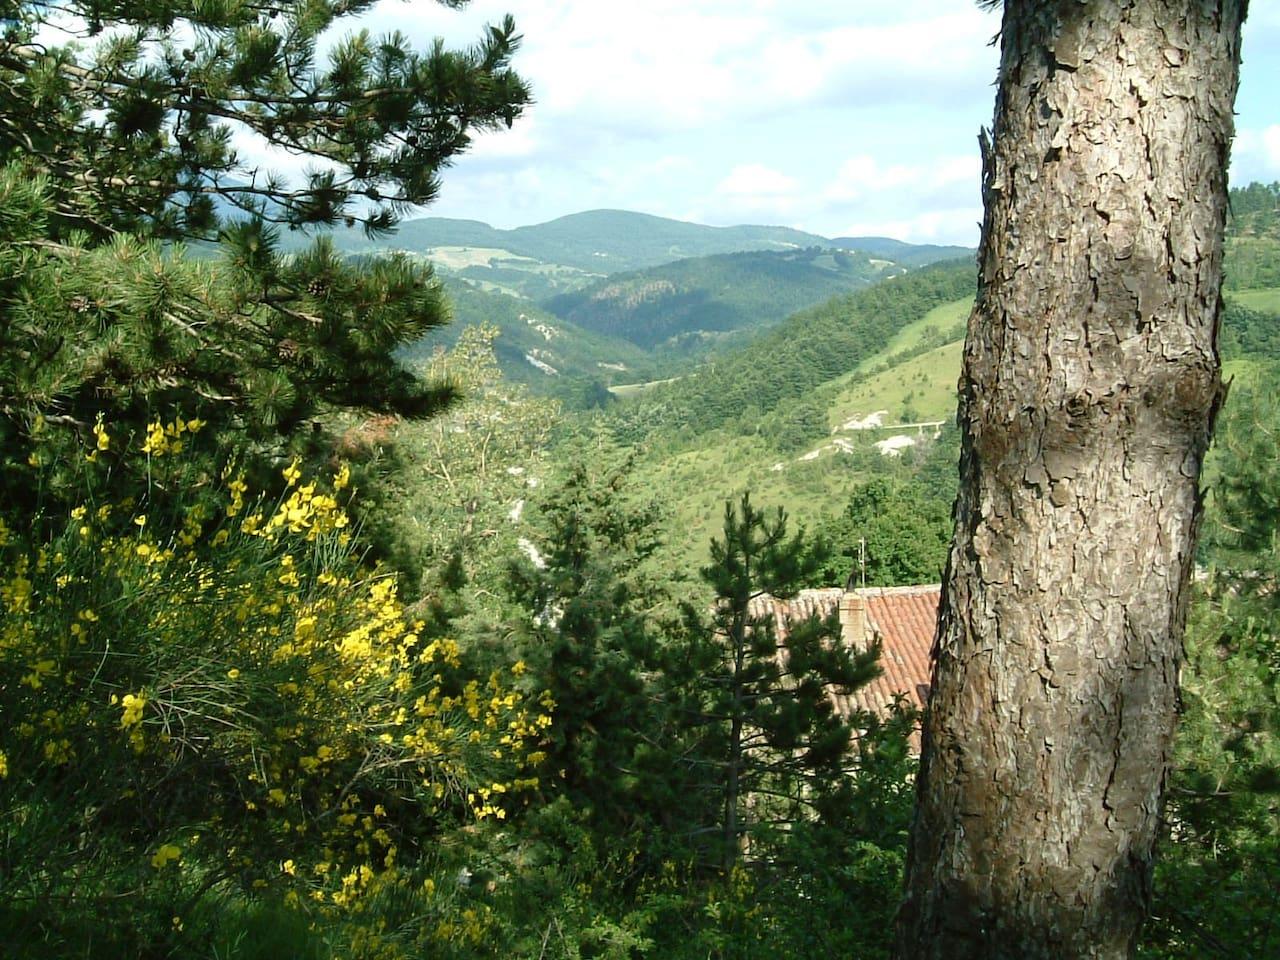 Chi Paolotti, an Italian estate